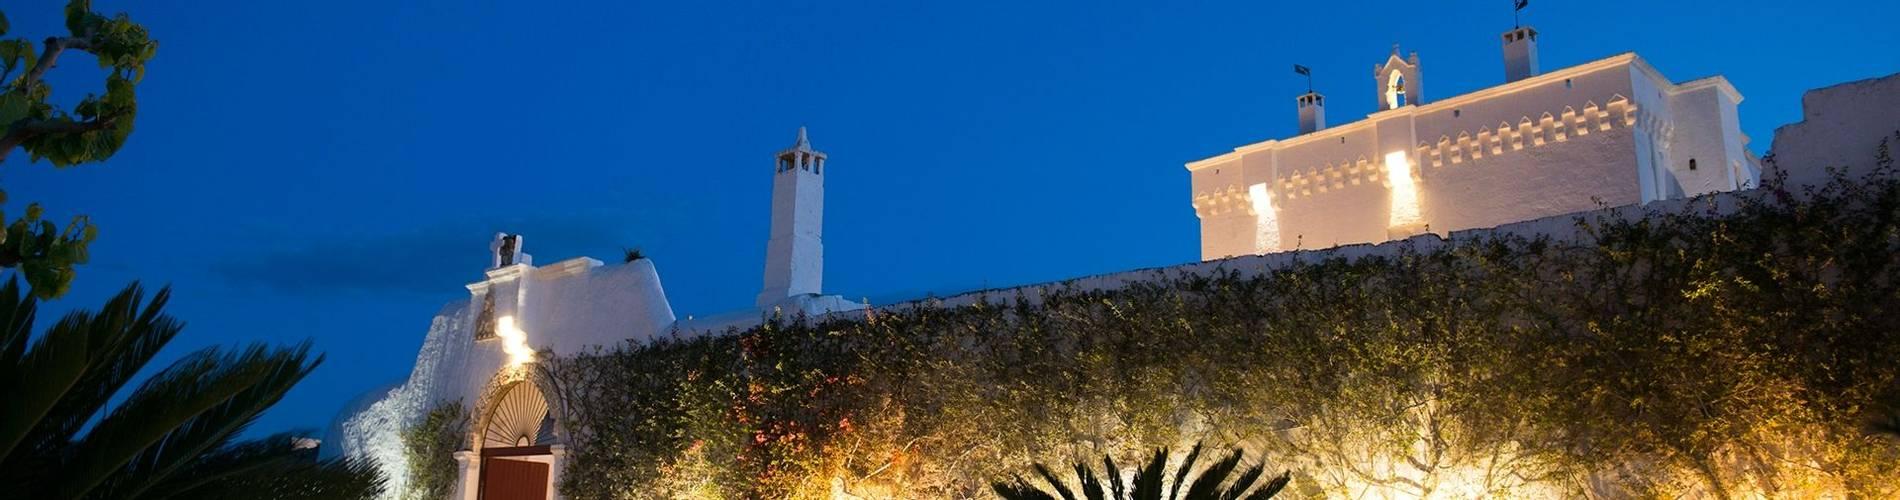 Masseria Torre Coccaro 9.jpg